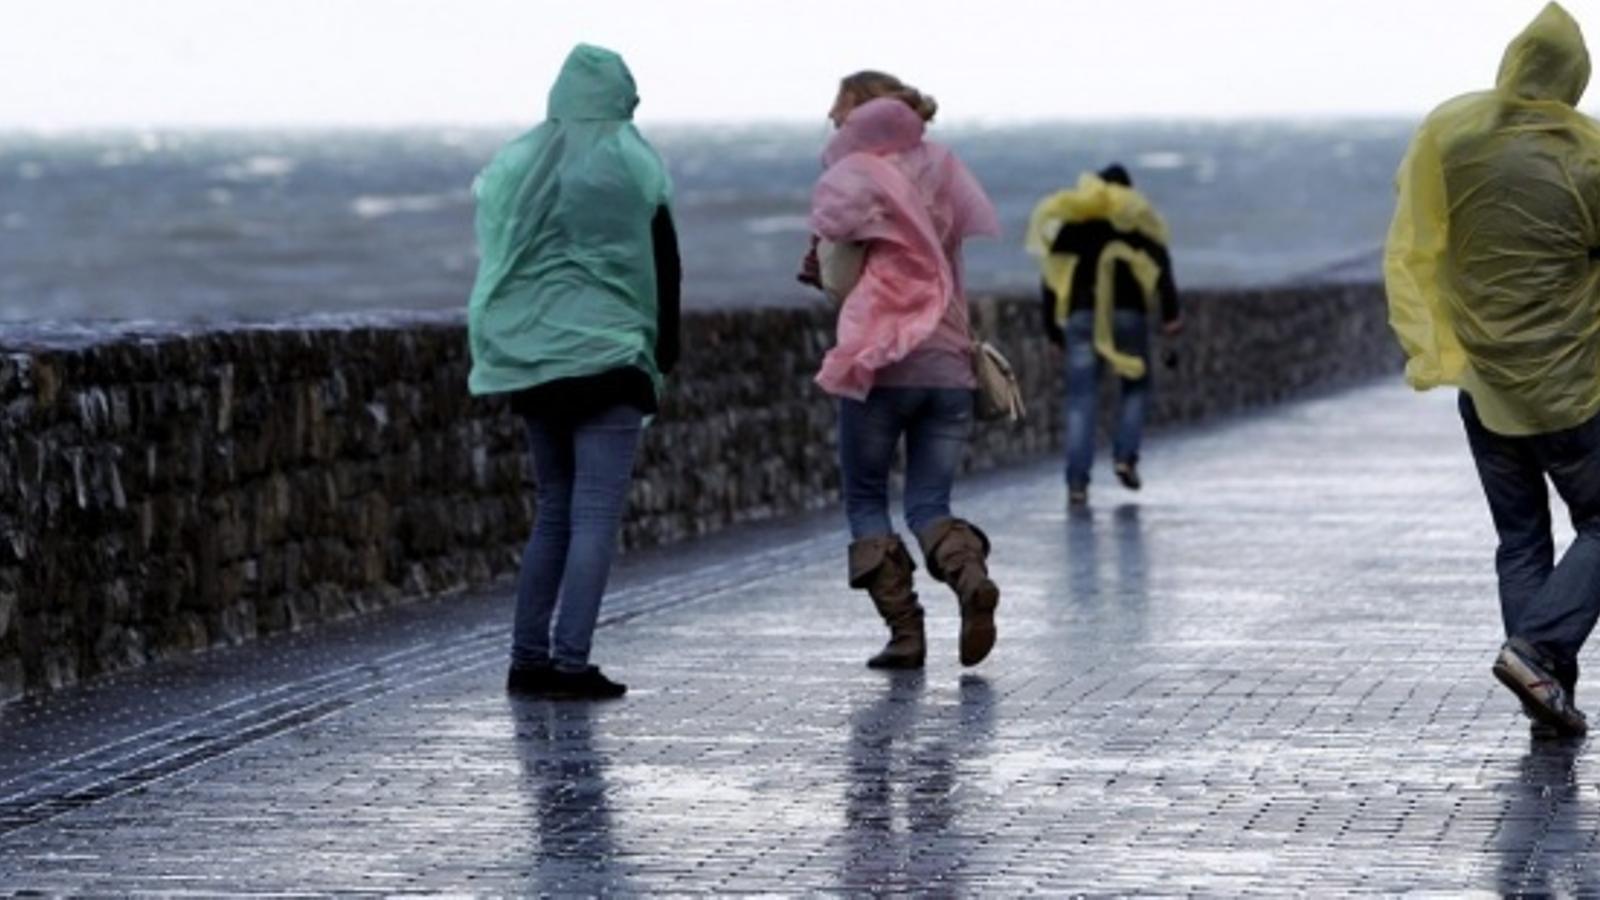 Fred i precipitacions a les Illes Balears